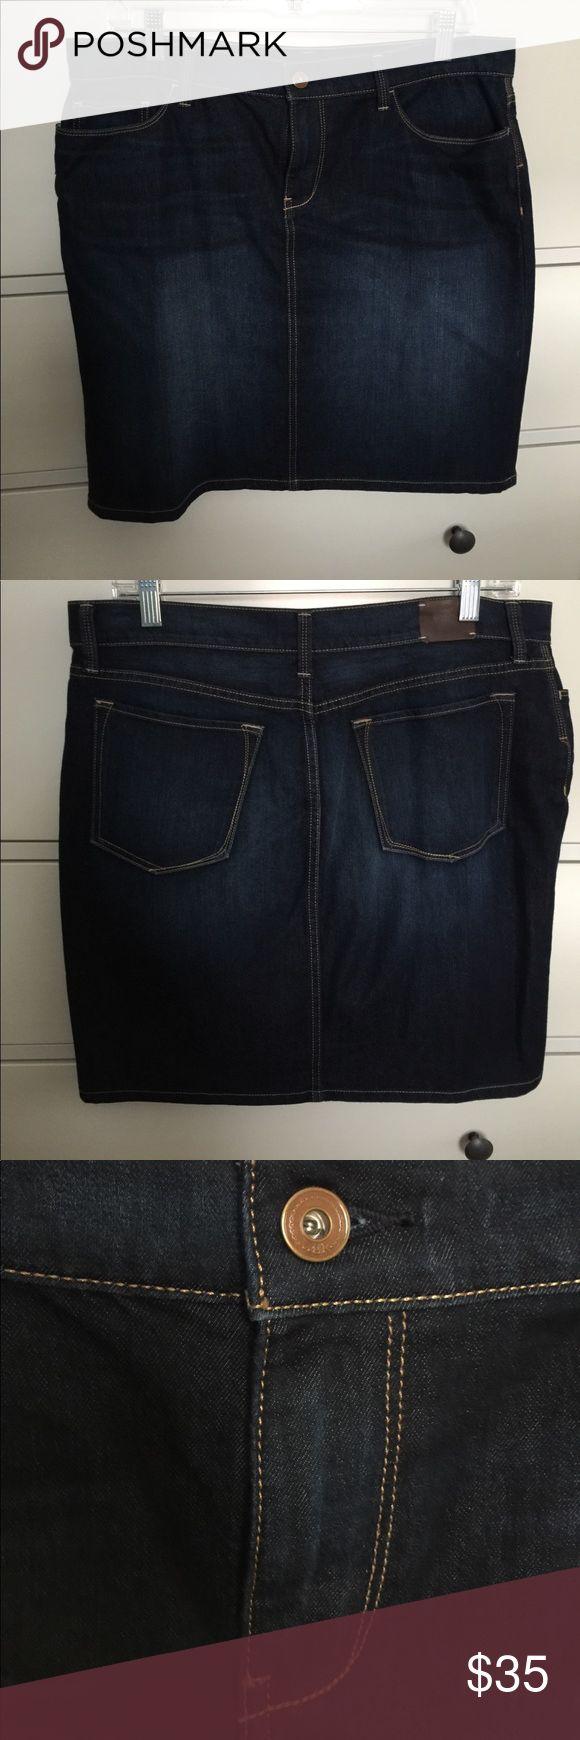 Mini jeans skirt- Banana Republic NWOT Brand new mini blue jeans pencil skirt, never worn, soft, stretch. Banana Republic Skirts Mini